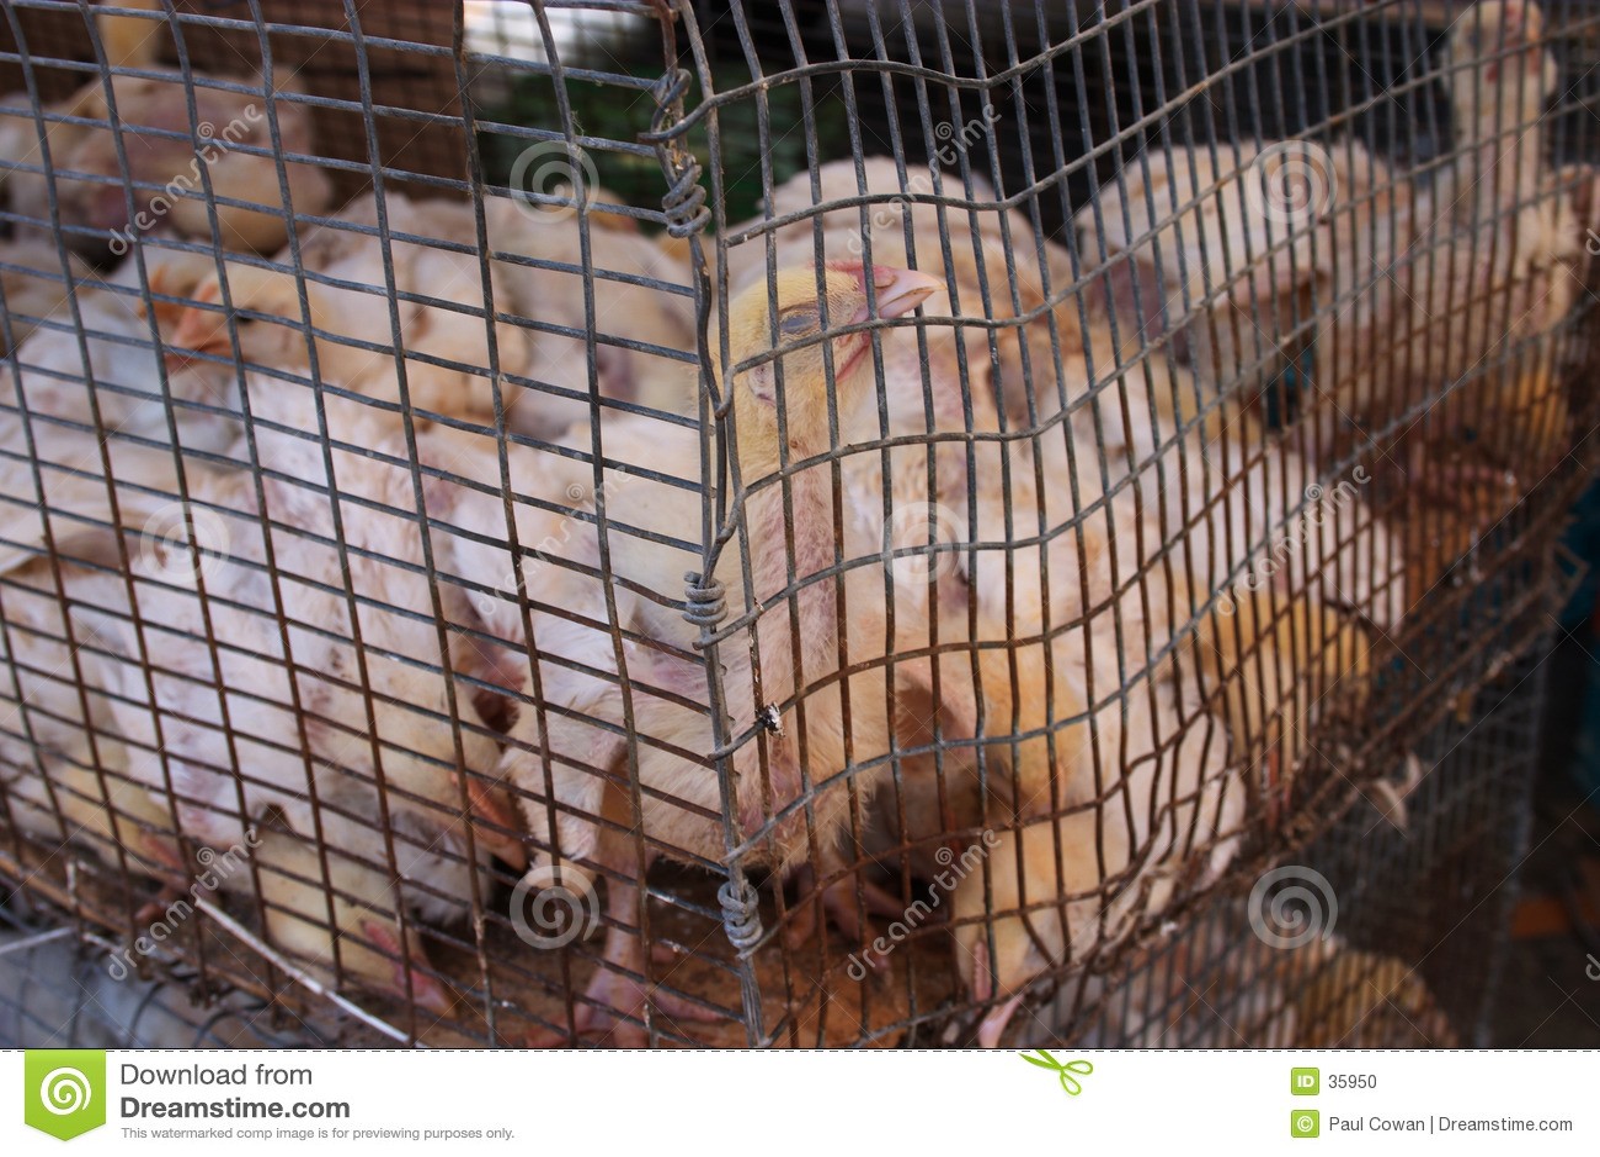 злоупотреблянные цыплята